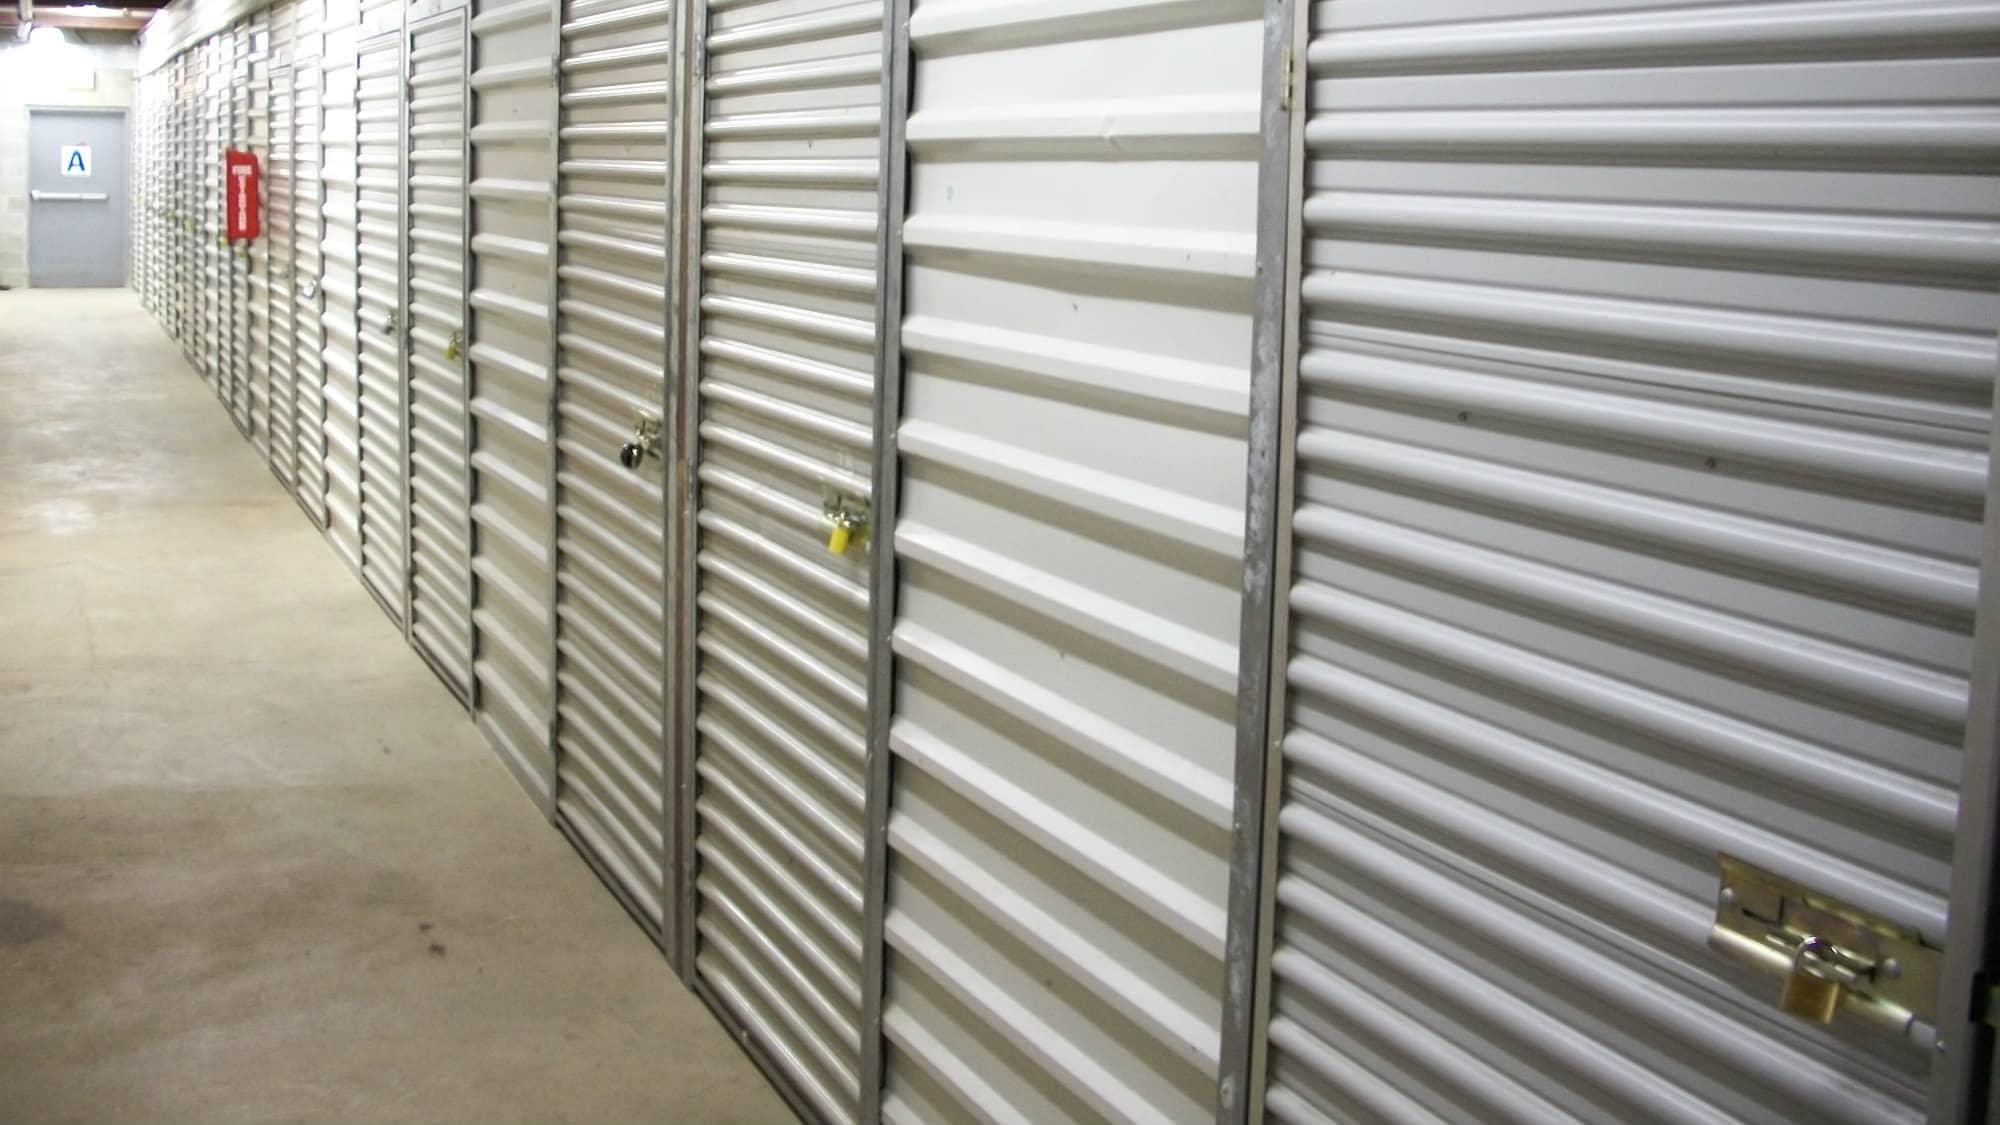 Roll-up doors at Self Storage Plus in Alexandria, VA